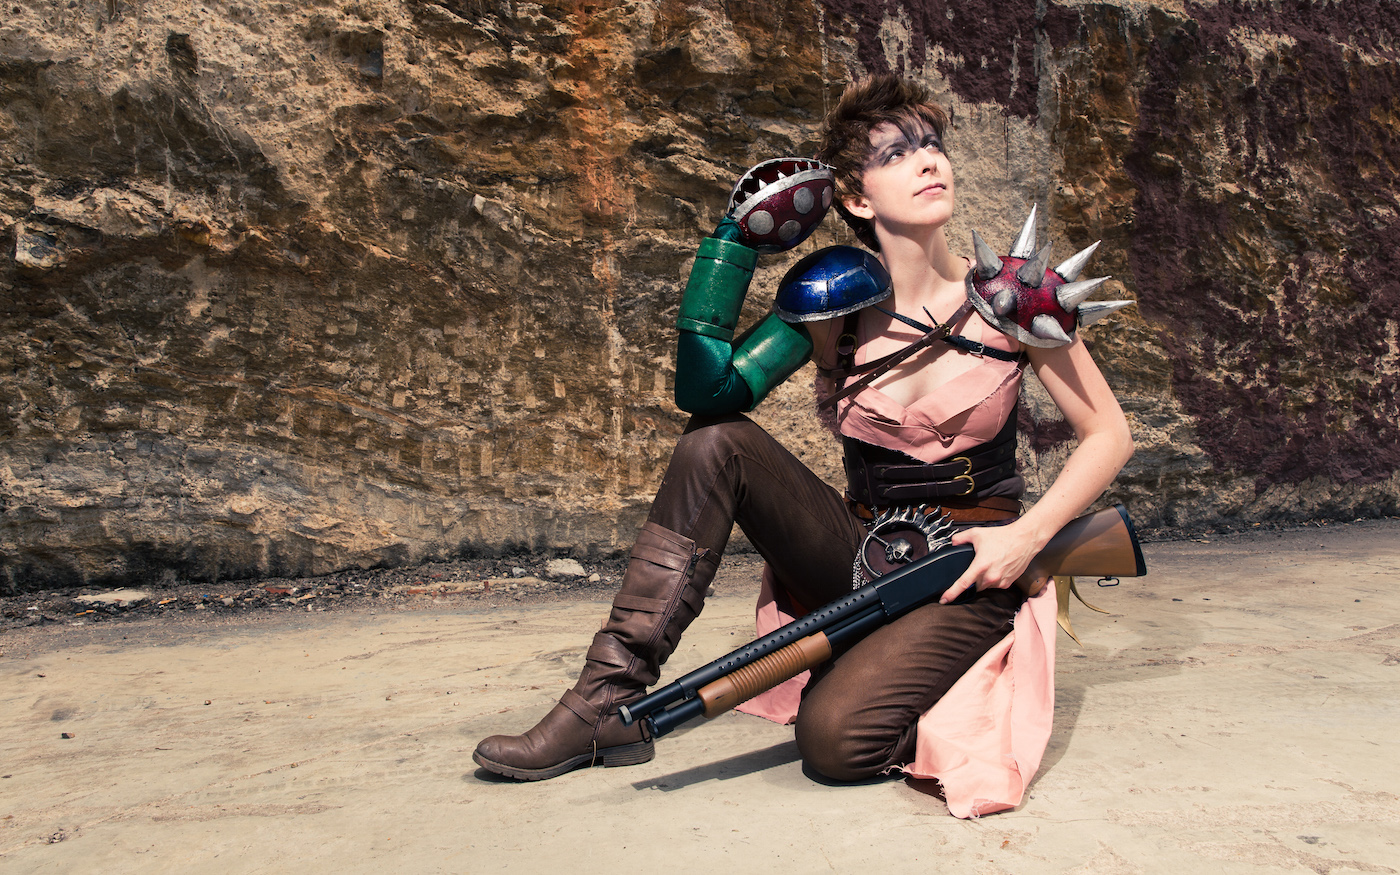 mad-max-fury-road-furiosa-and-princess-peach-cosplay-mashup-imperator-peachiosa3.jpeg